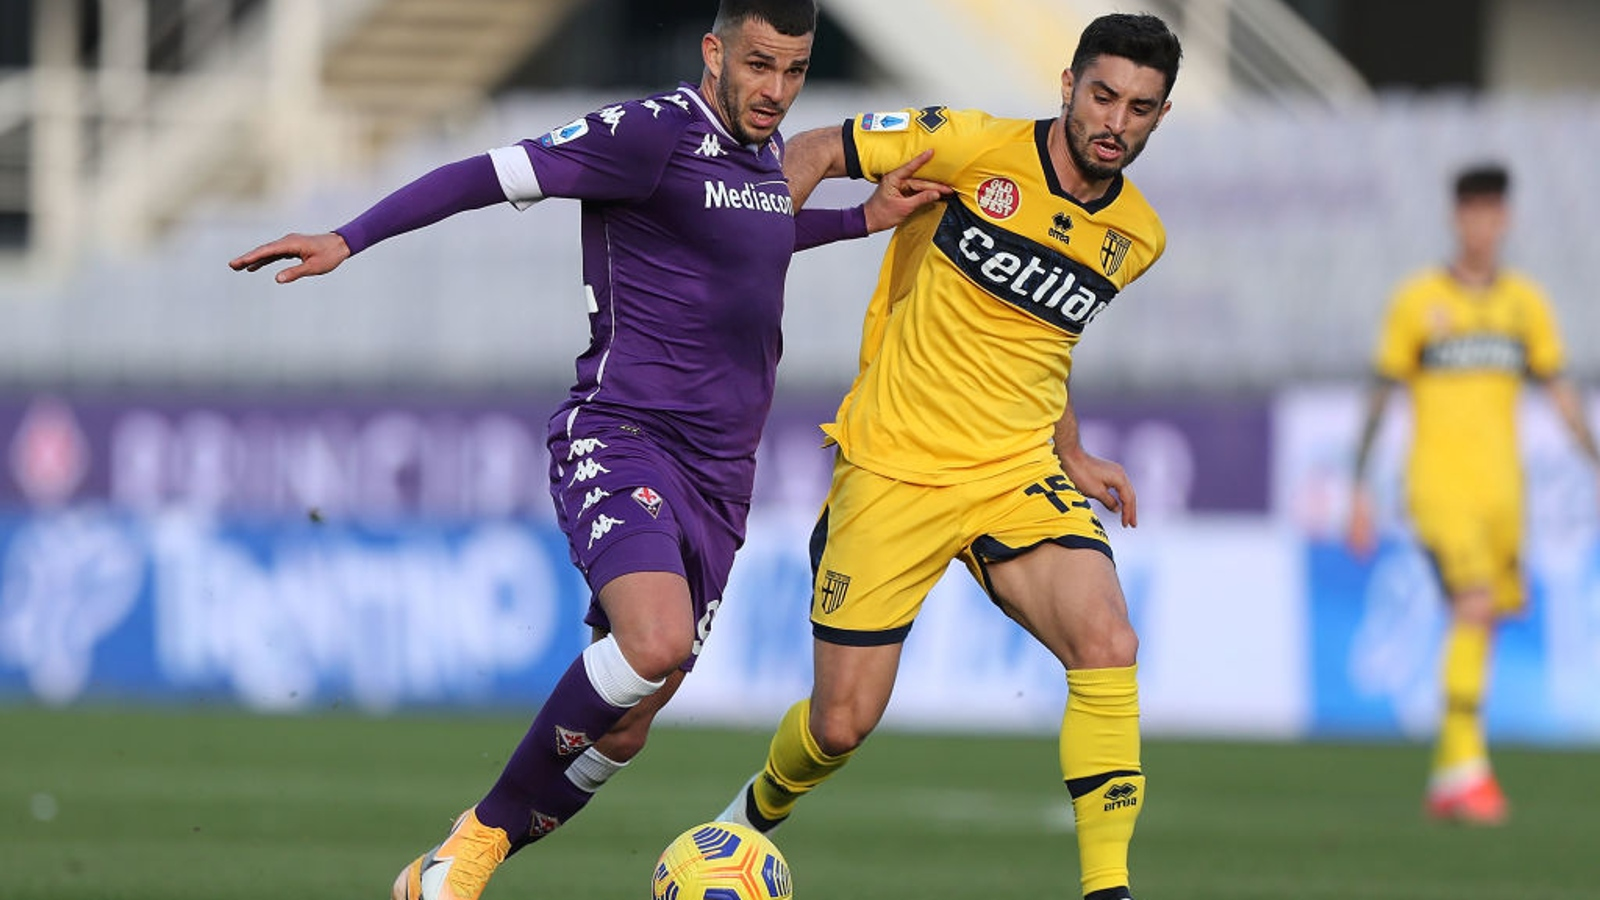 Fiorentina - Parma 3-3 - Calcio - Rai Sport